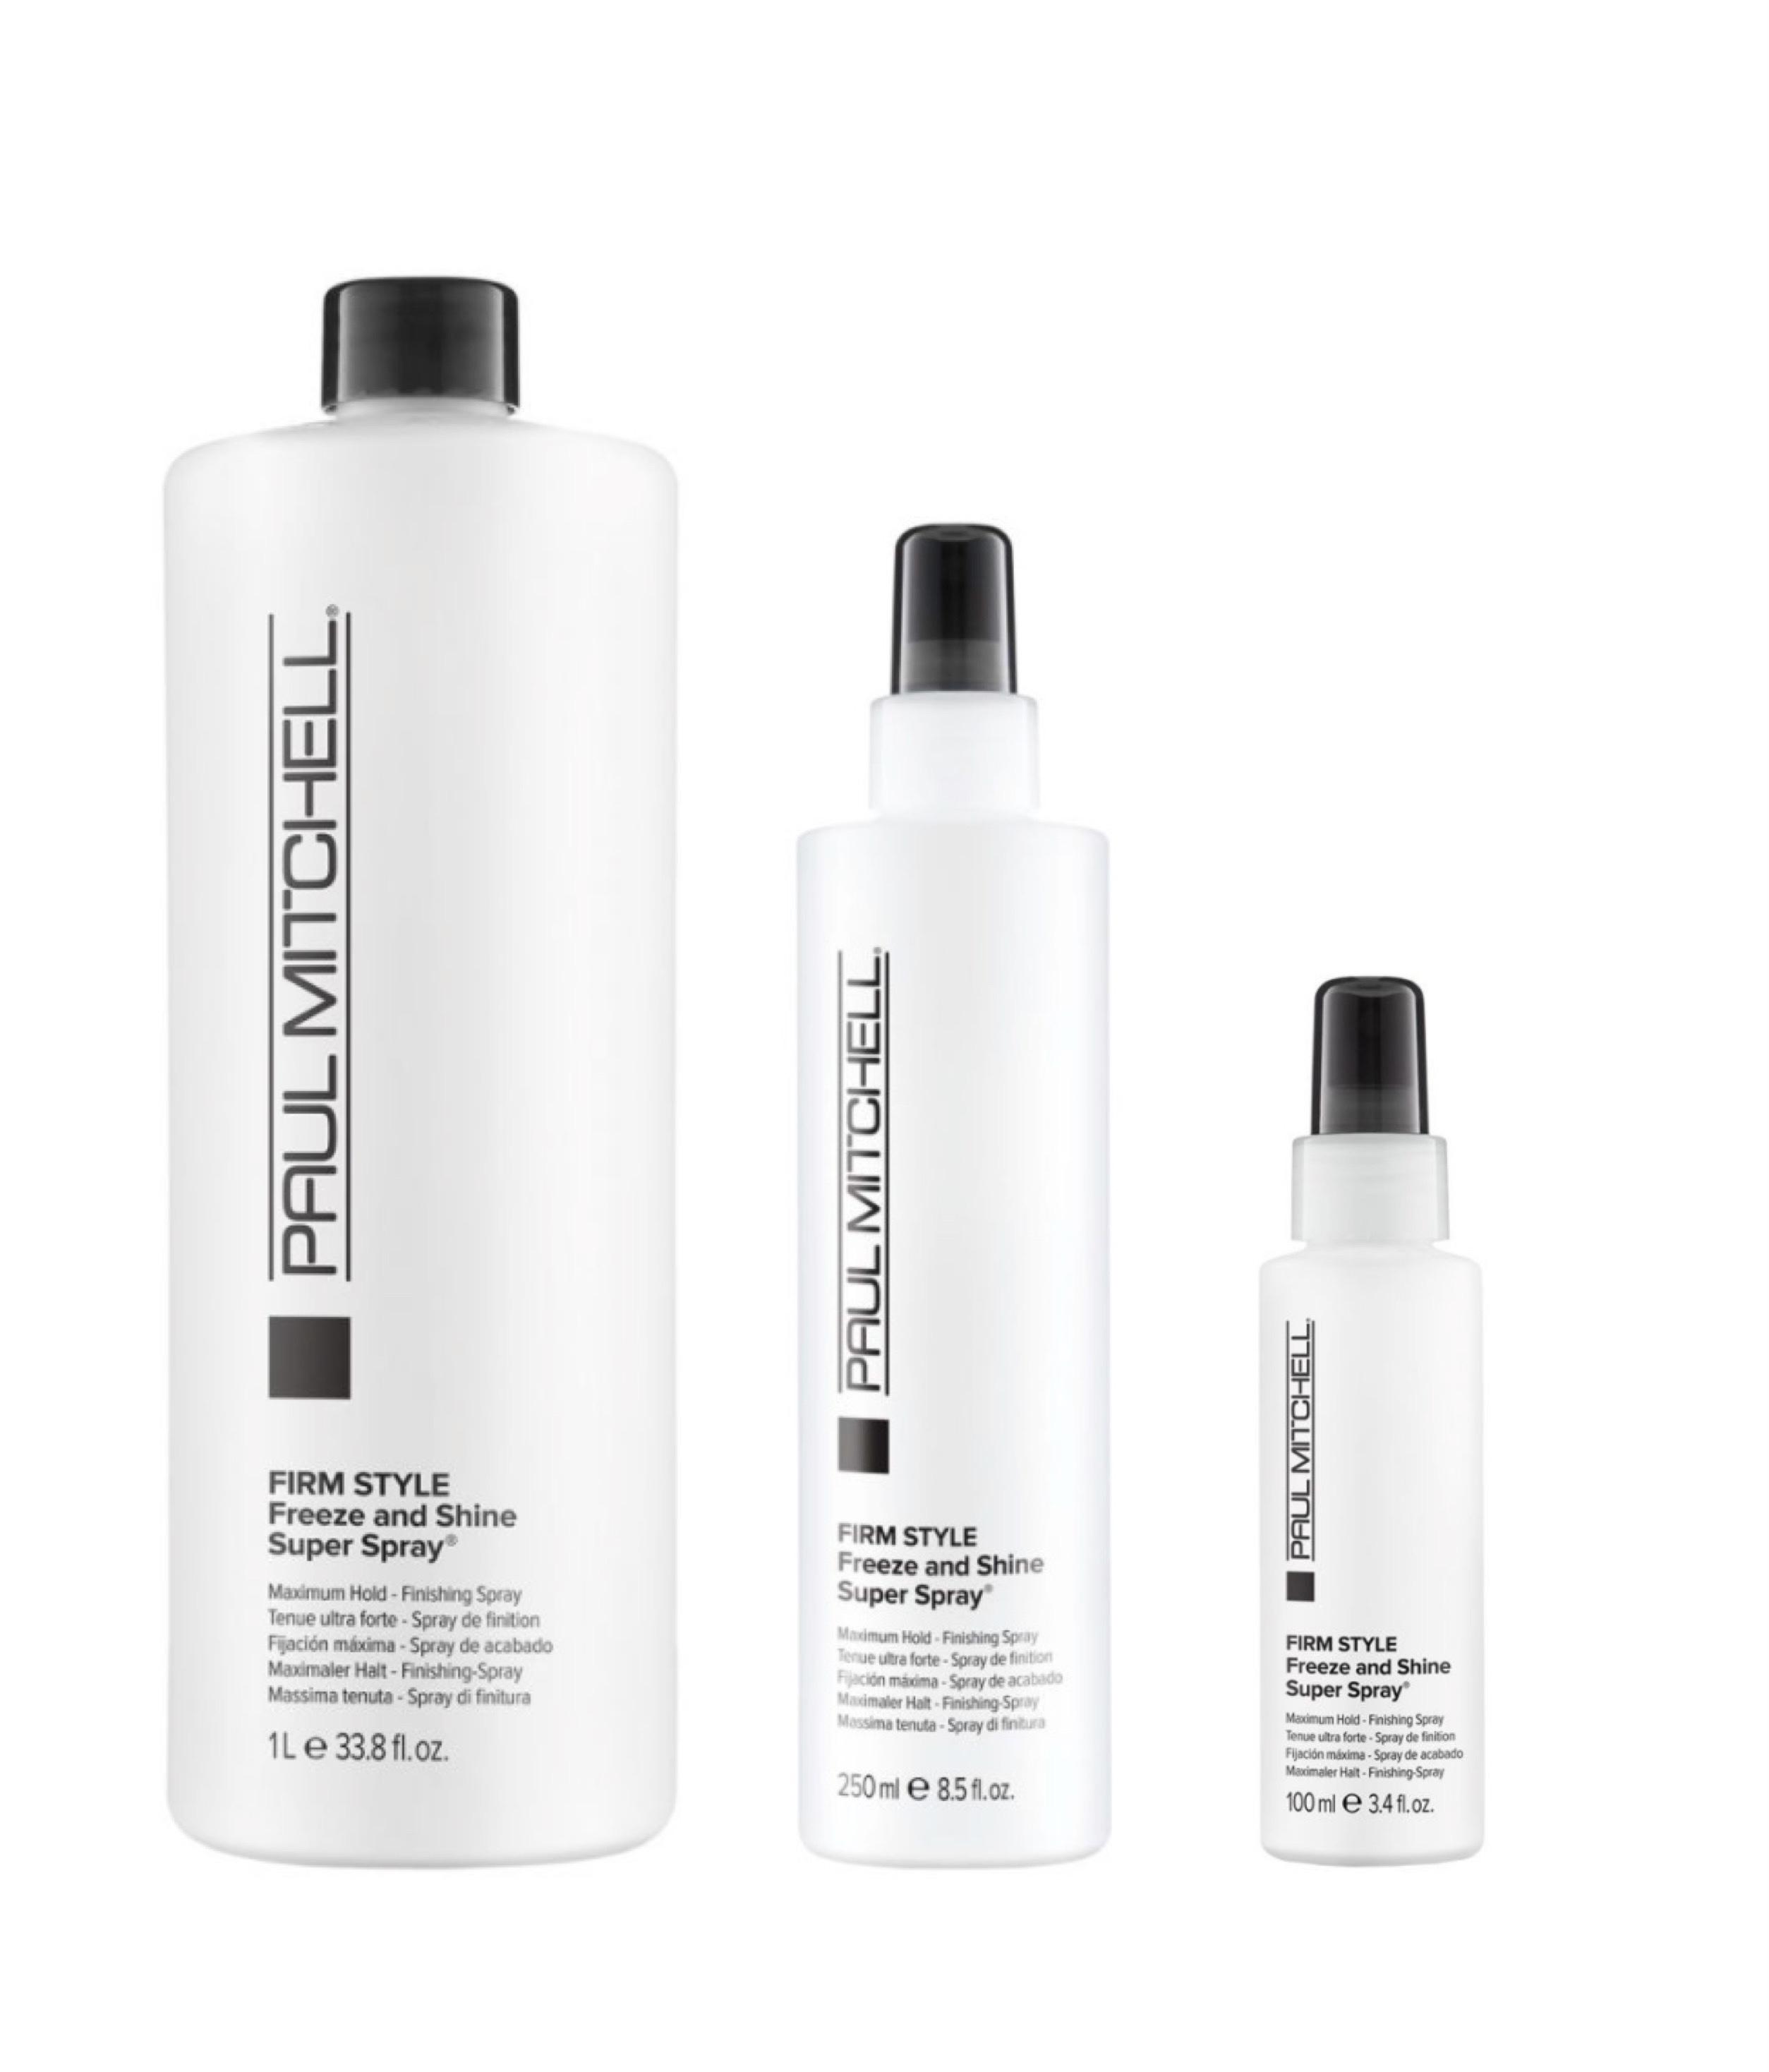 Paul Mitchell Firm Style Freeze and Shine Super Spray - finishing sprej